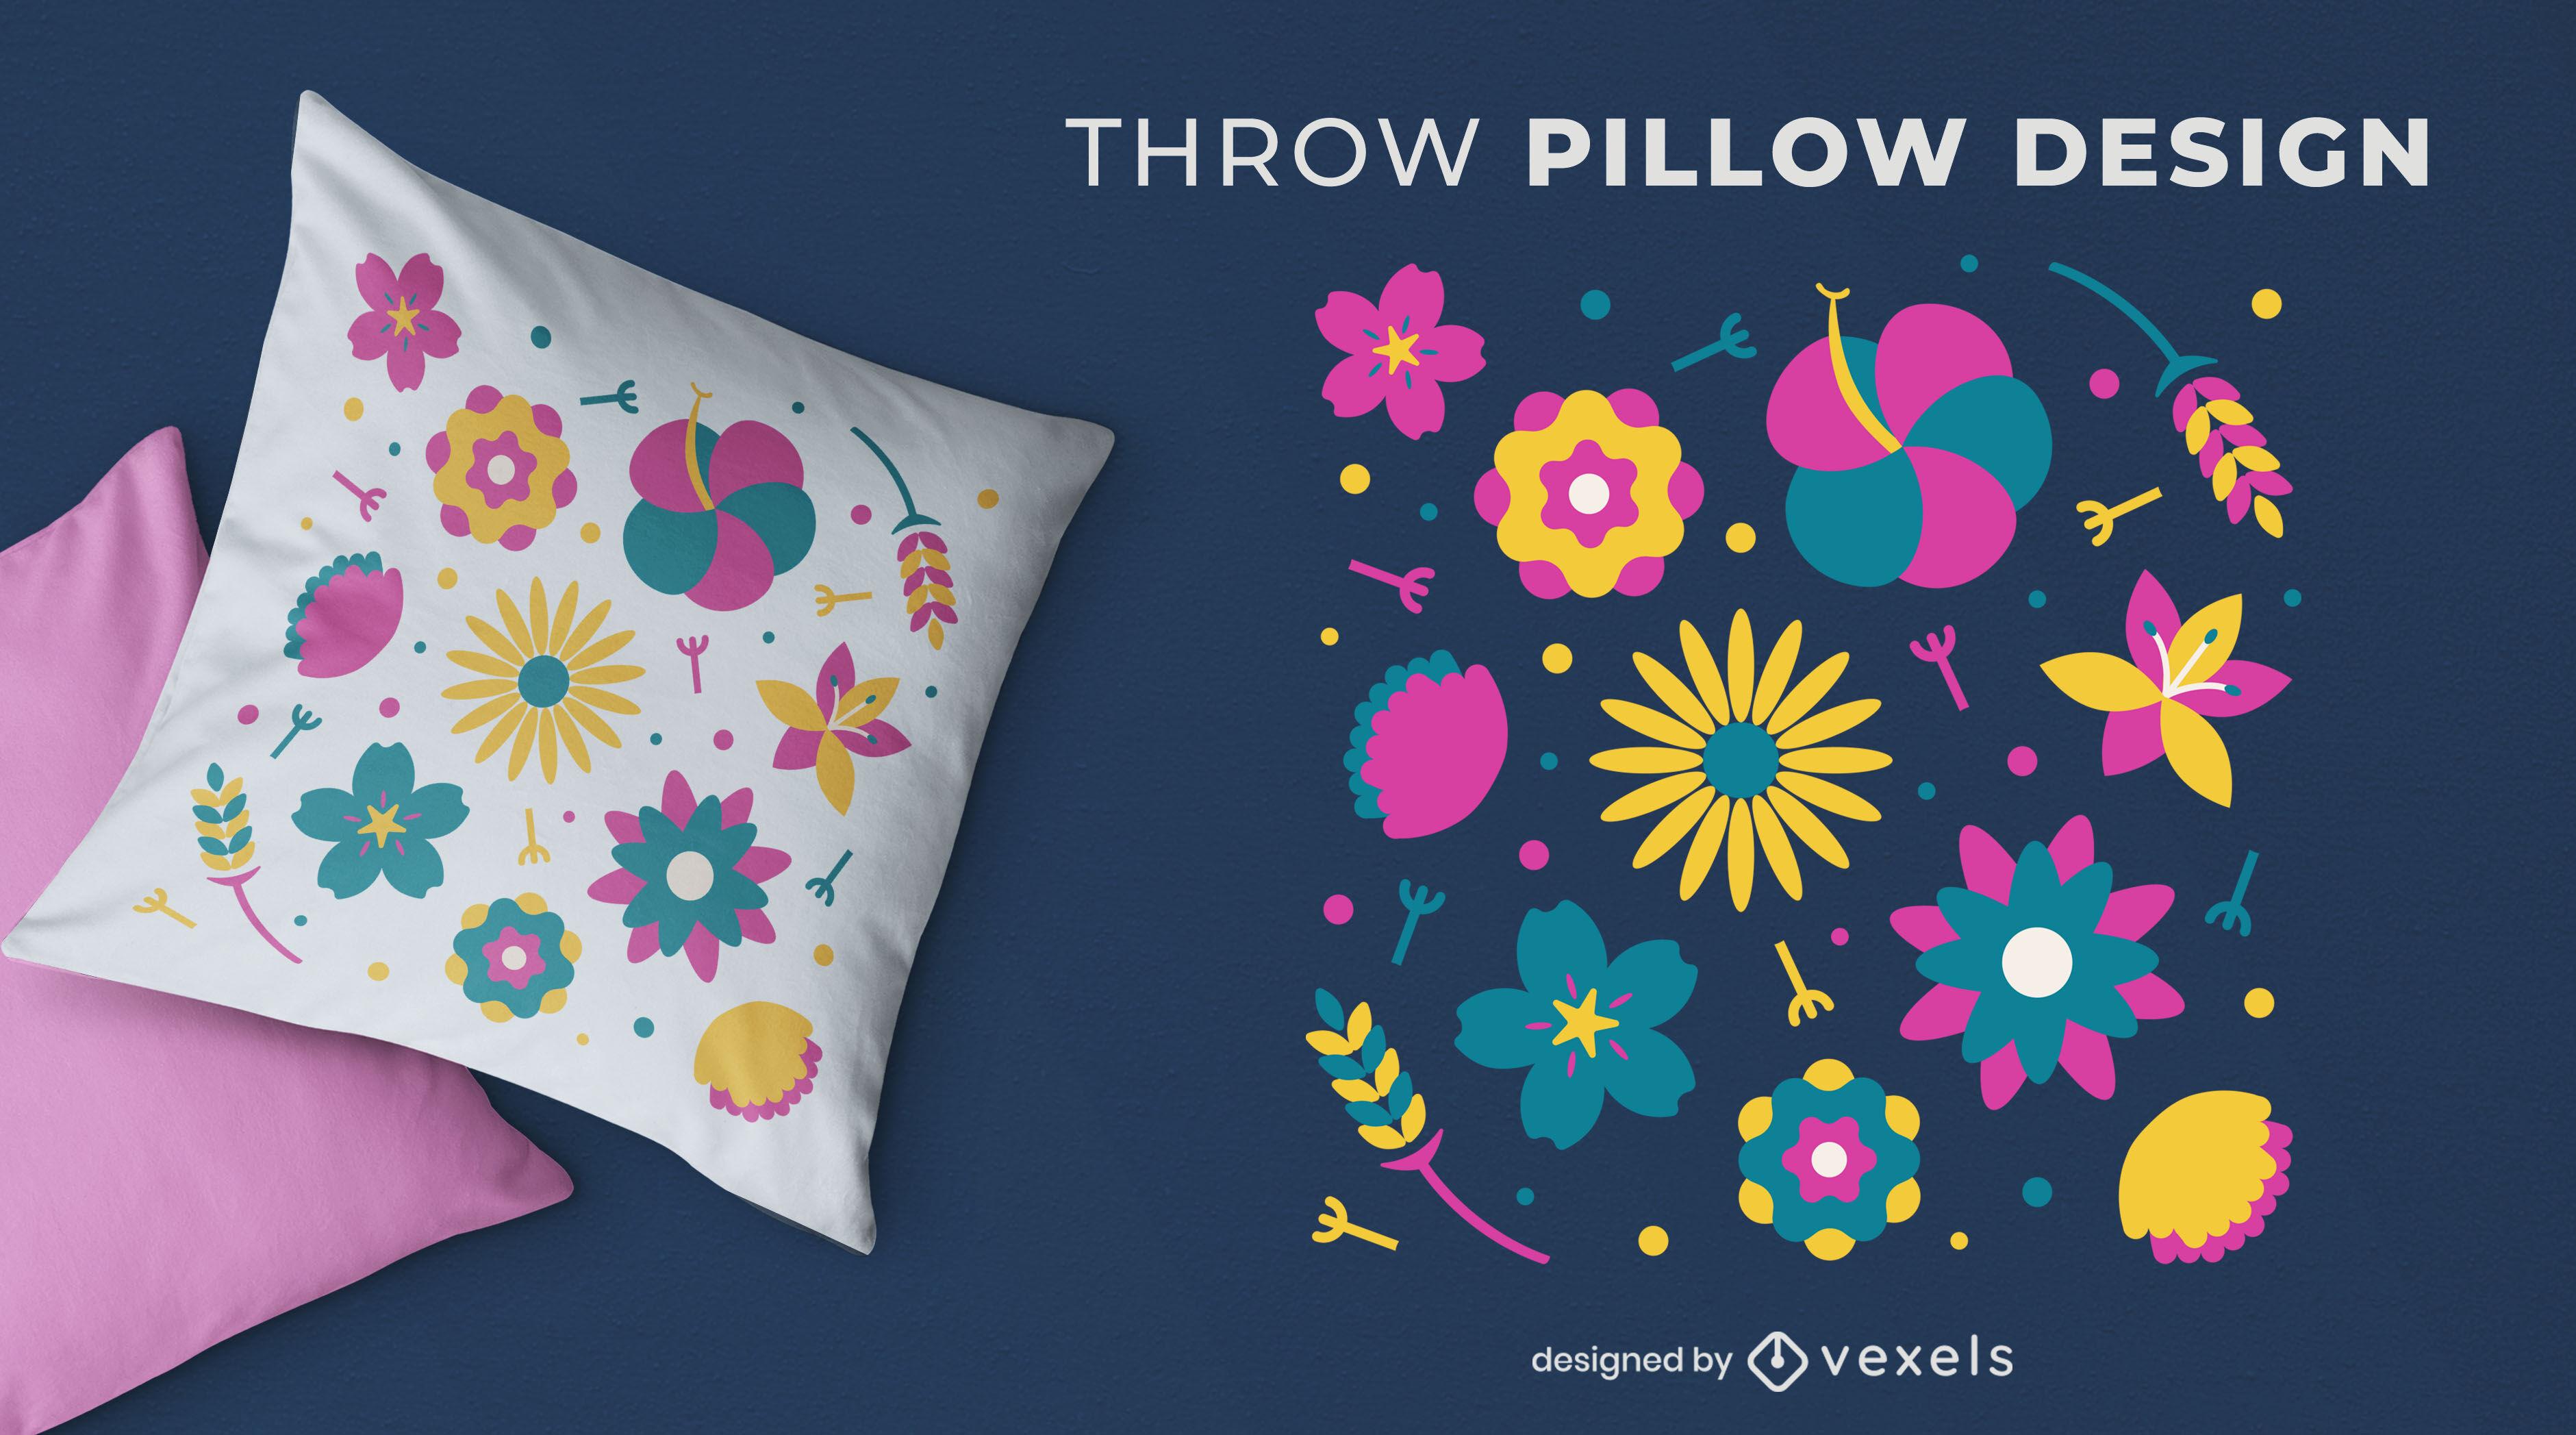 Dise?o colorido de la almohada de tiro de la naturaleza de las flores